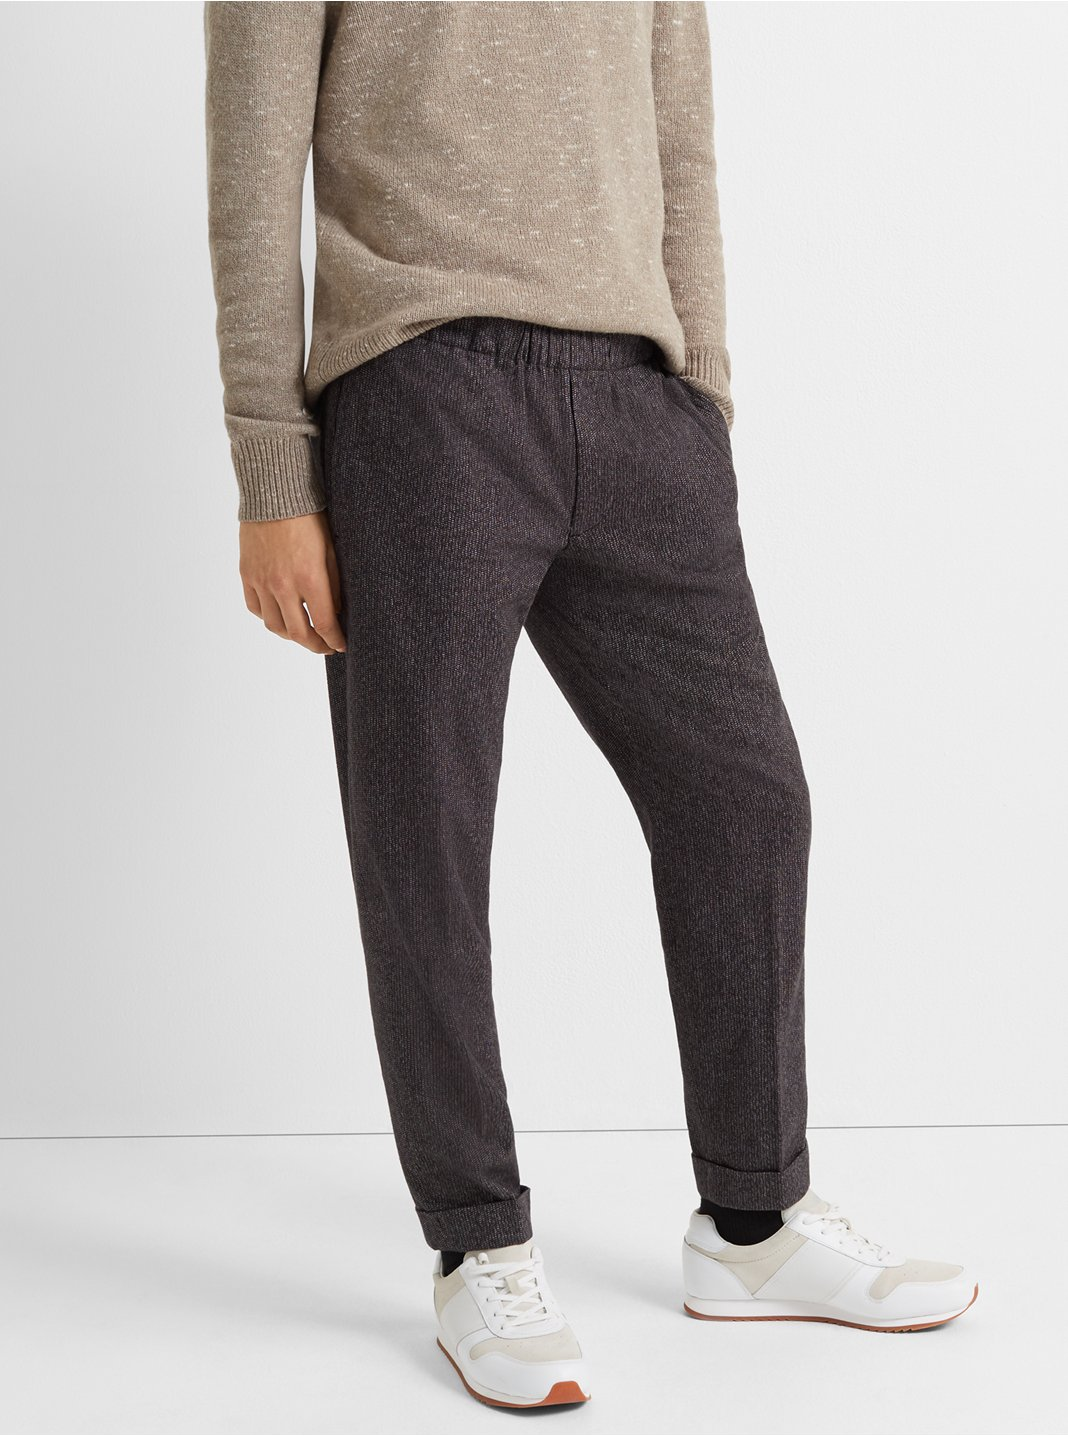 Elasticated Pull-On Pant